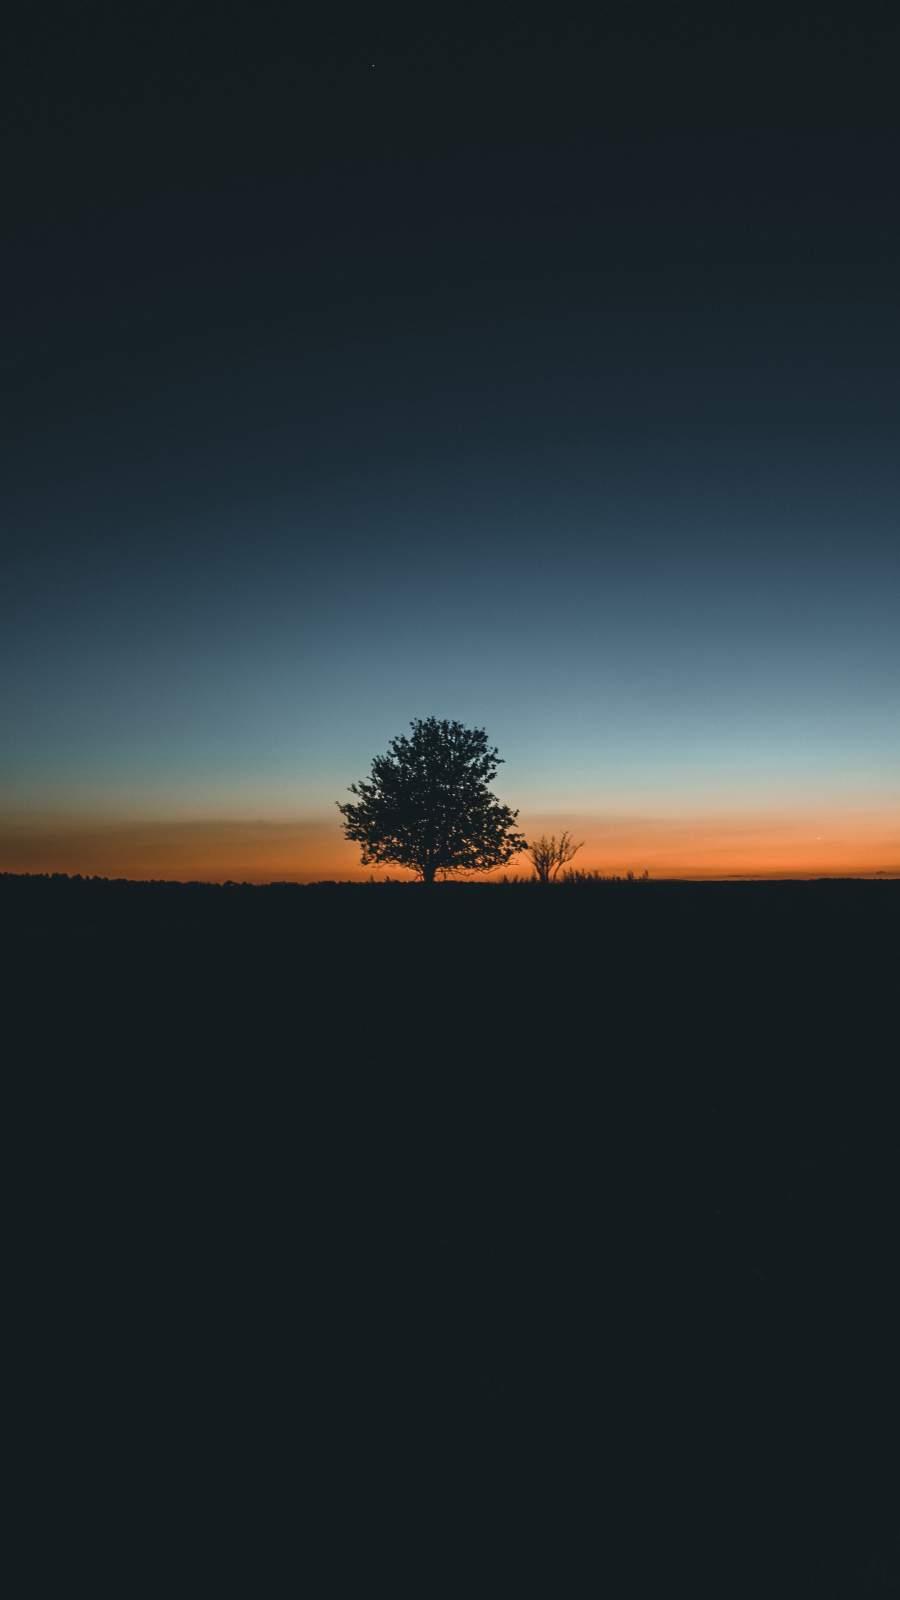 Tree Silhouette iPhone Wallpaper